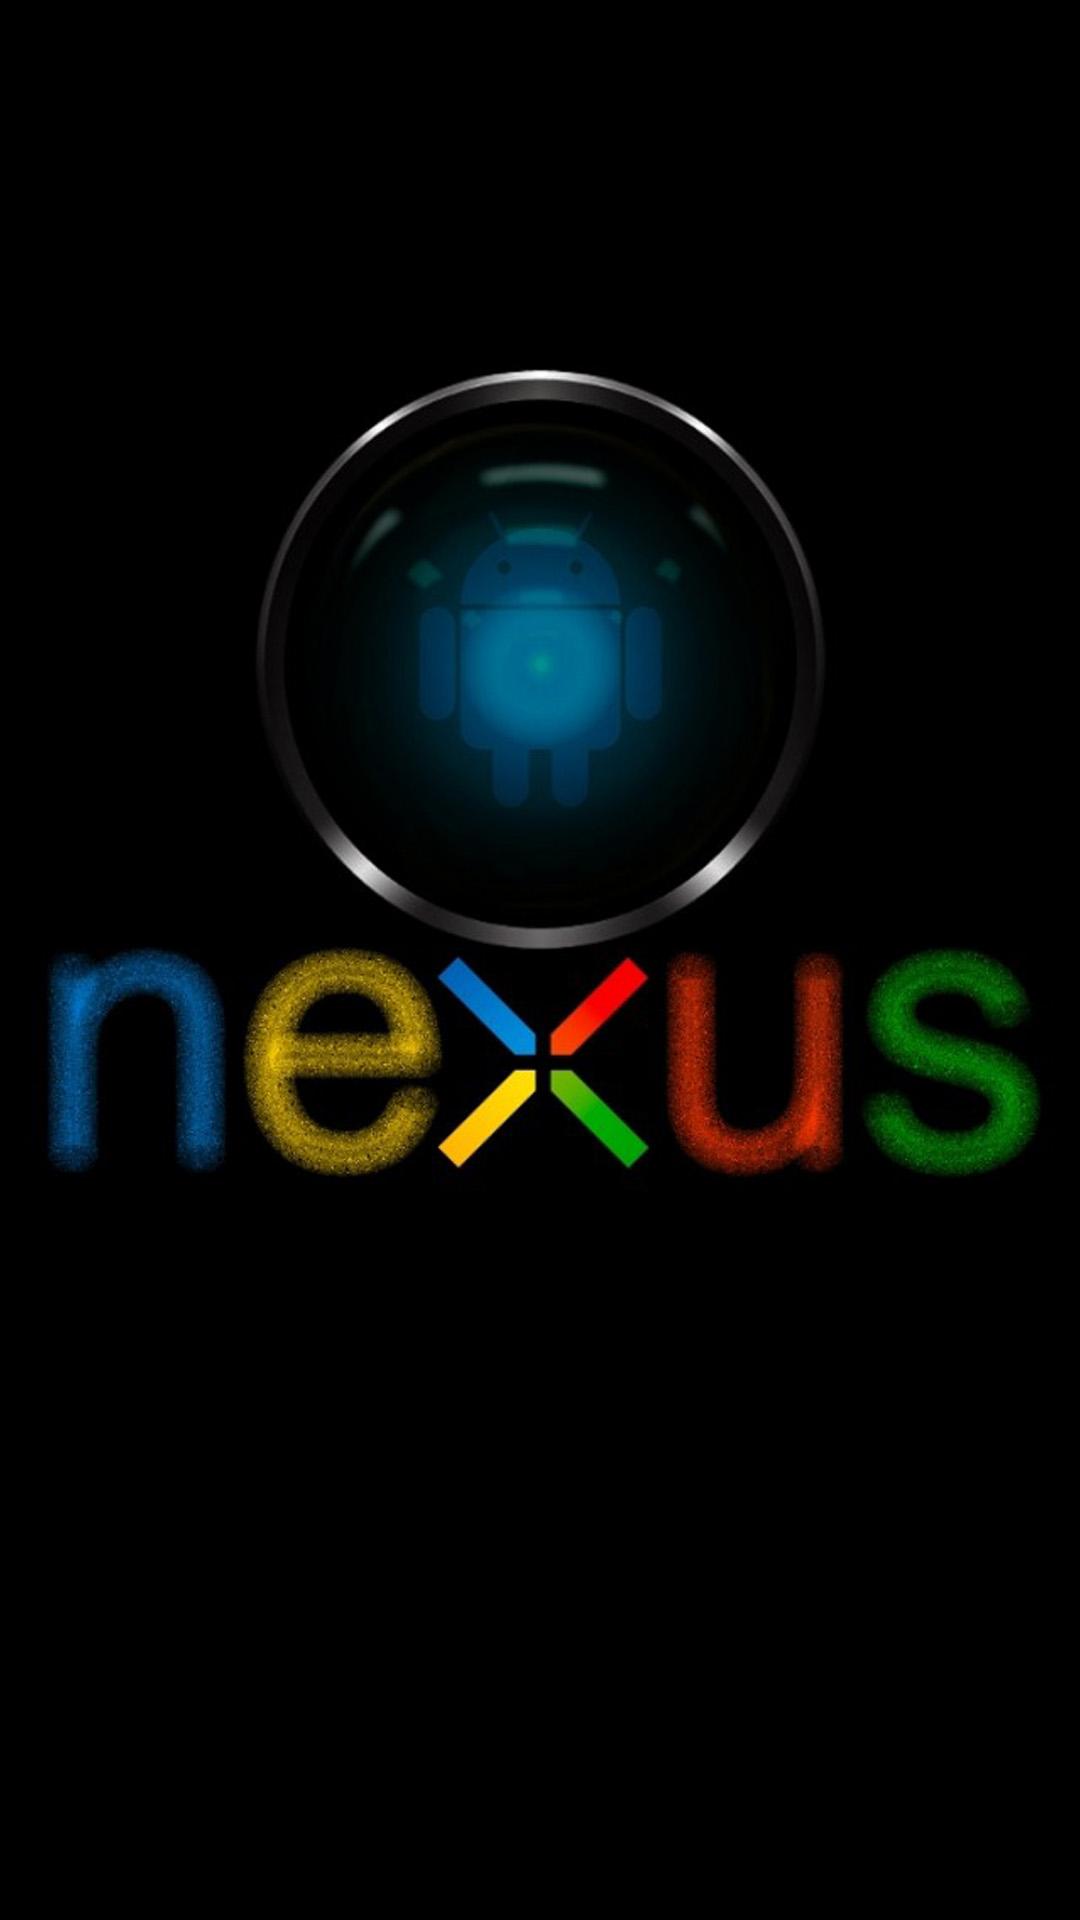 47+ Nexus 5 Wallpaper on WallpaperSafari